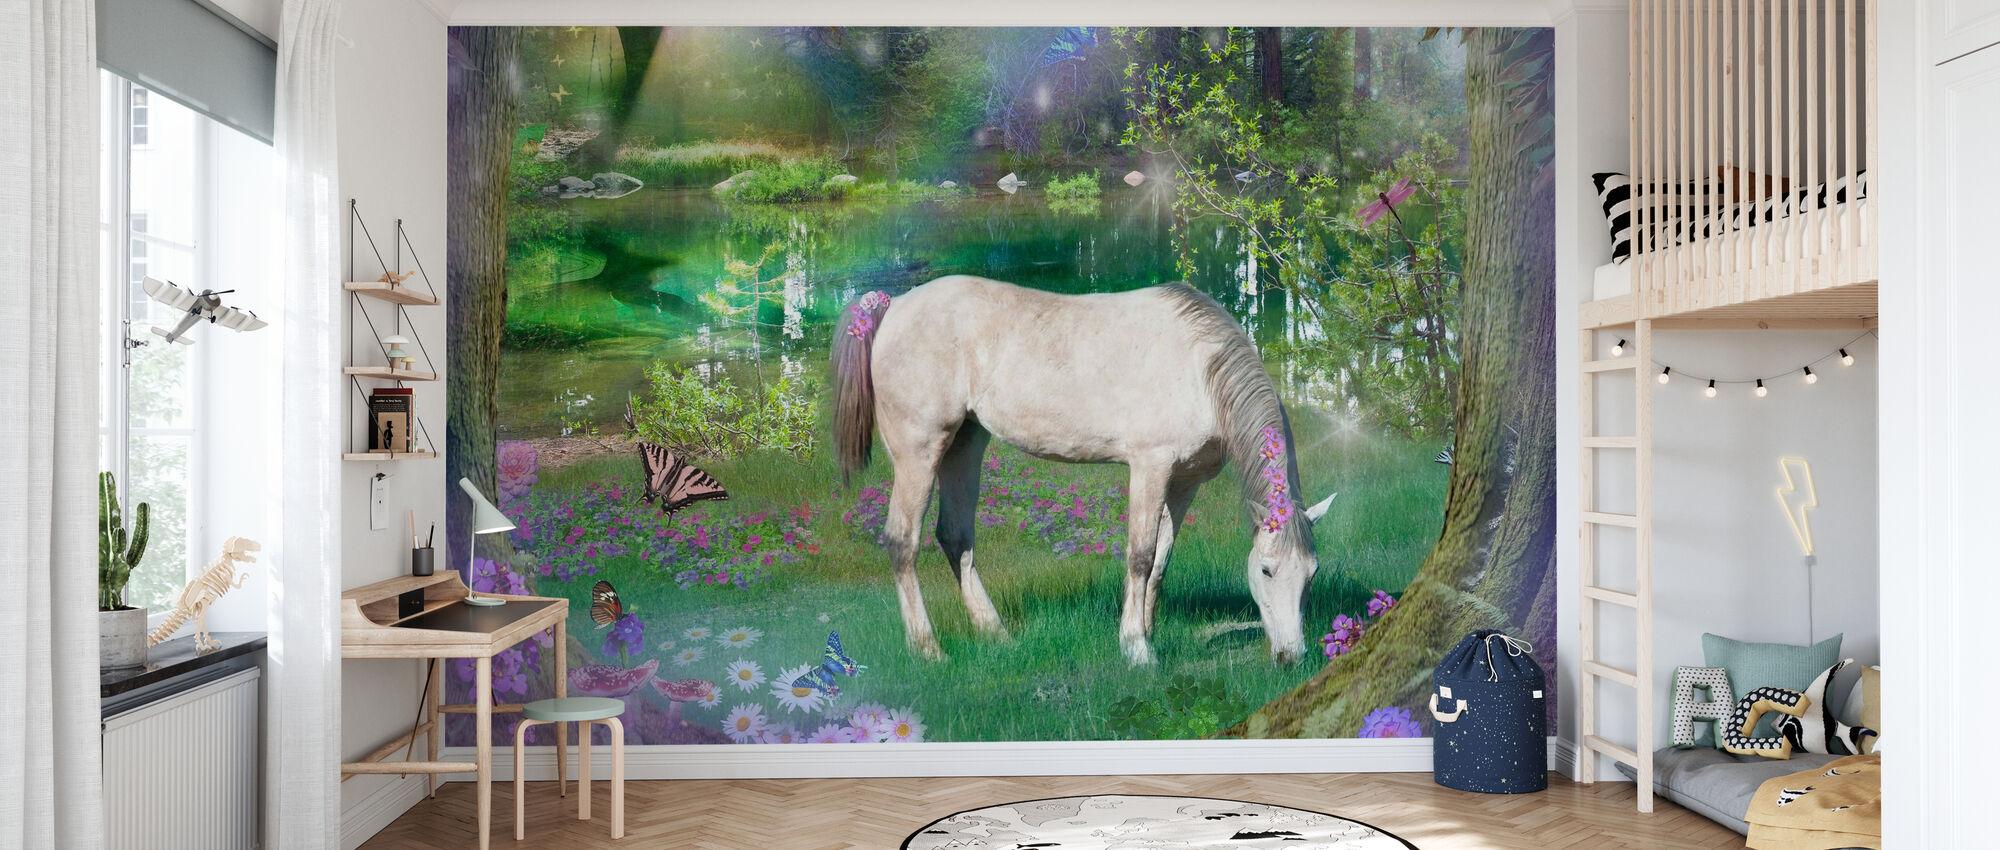 Emerald Unicorn - Wallpaper - Kids Room